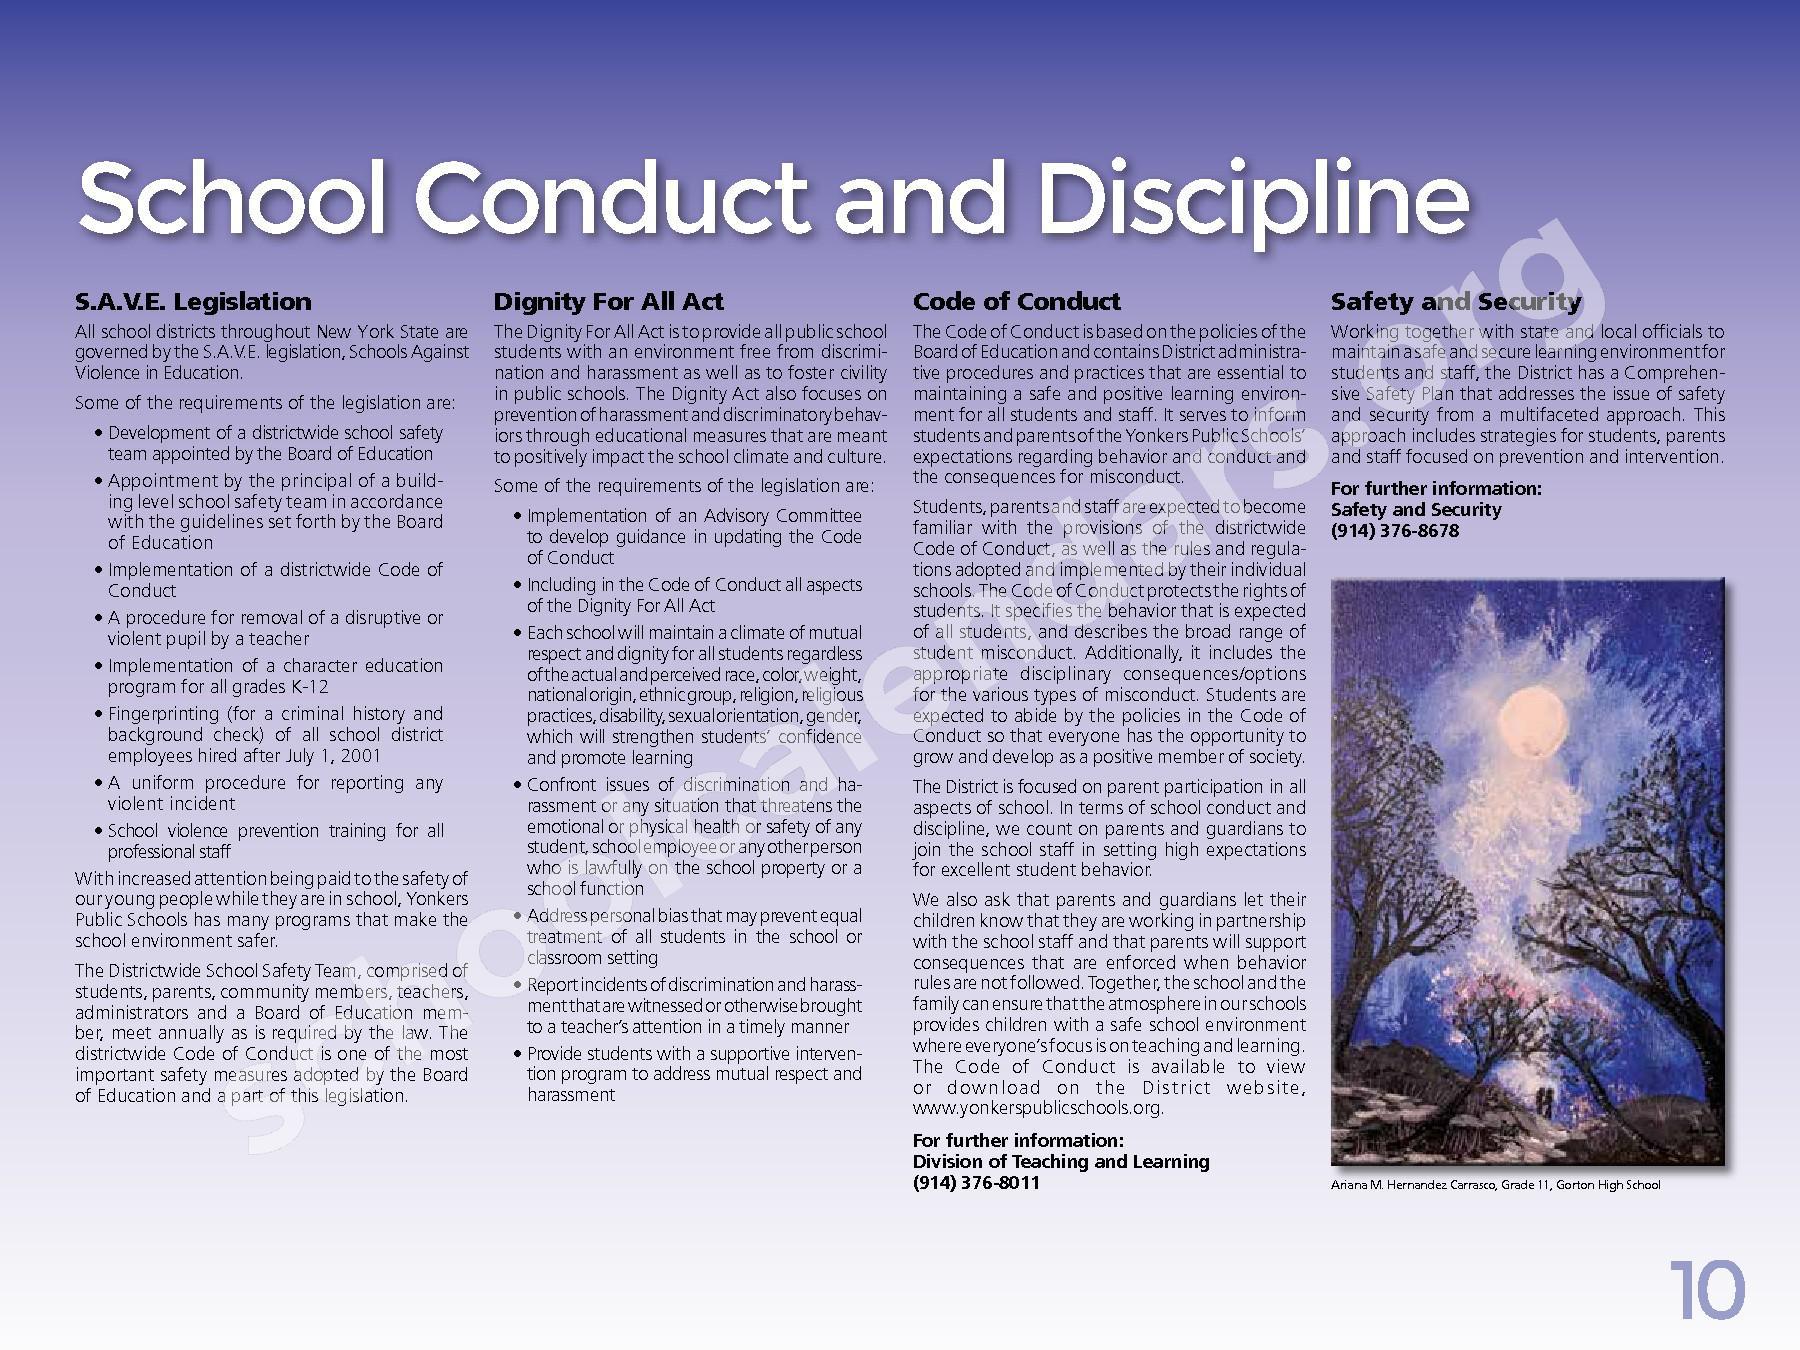 2017 - 2018 District Calendar – Yonkers City School District – page 12